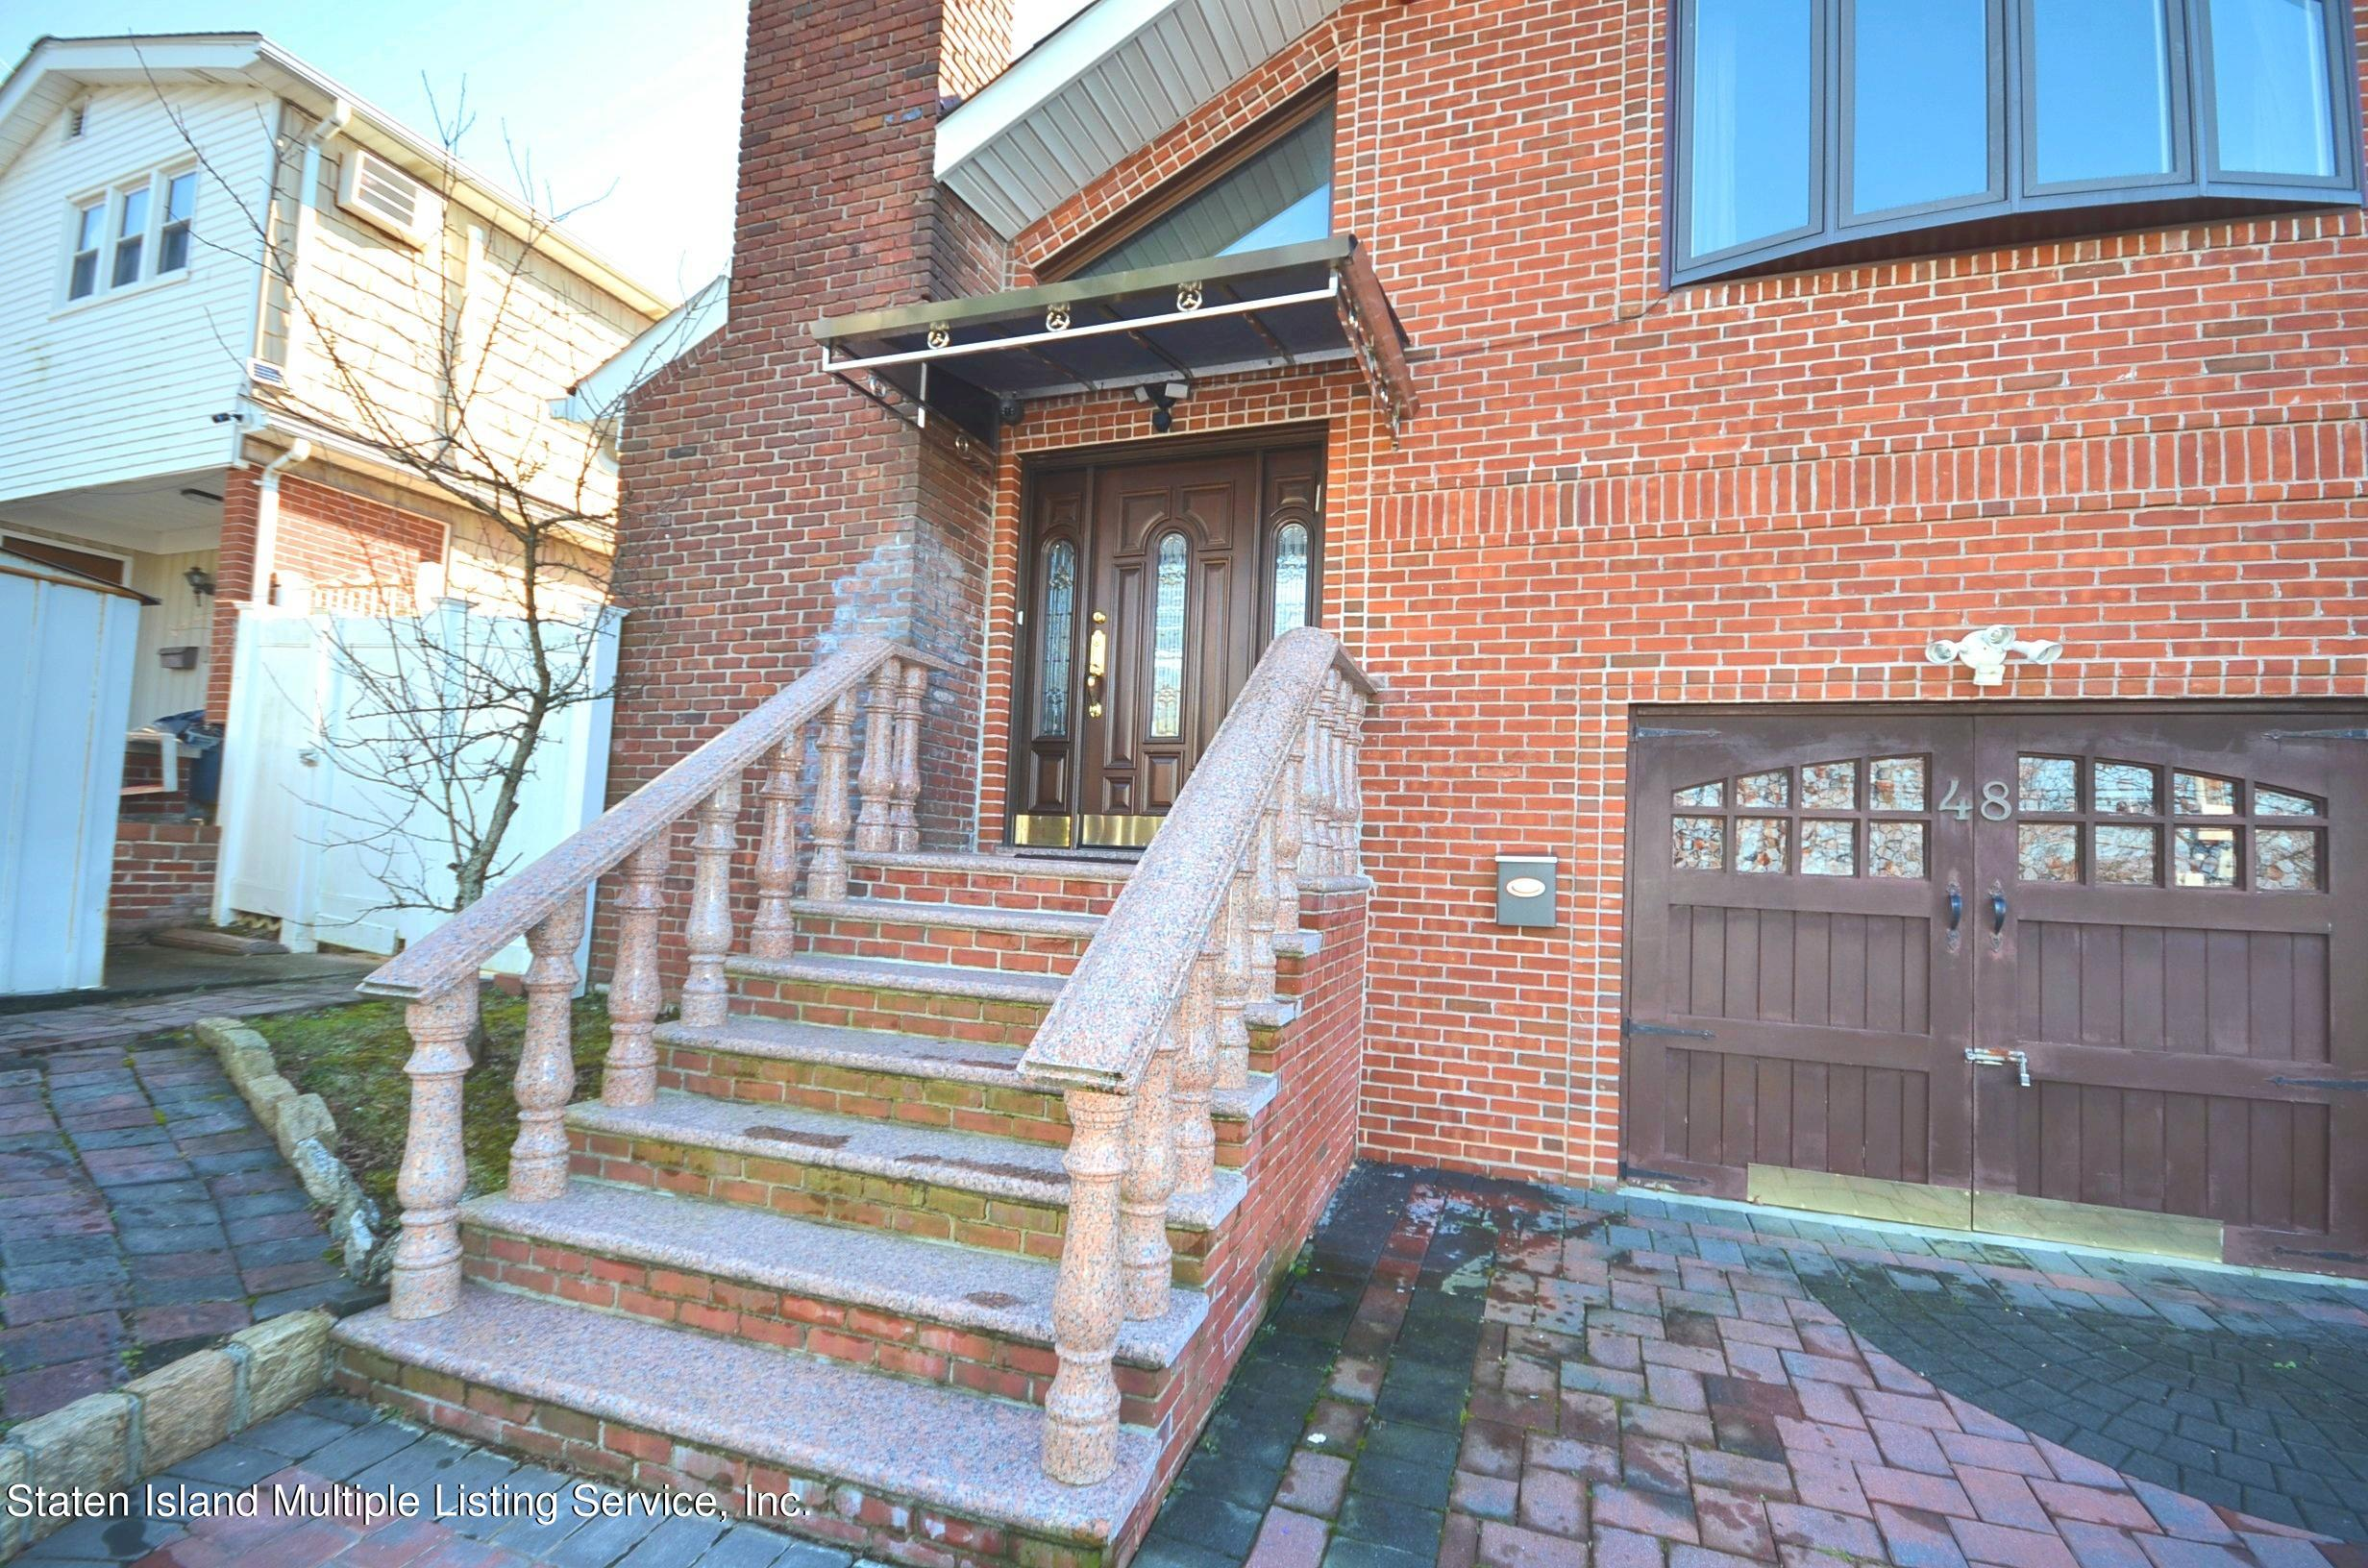 Single Family - Detached 48 Ocean Terrace  Staten Island, NY 10314, MLS-1142240-6